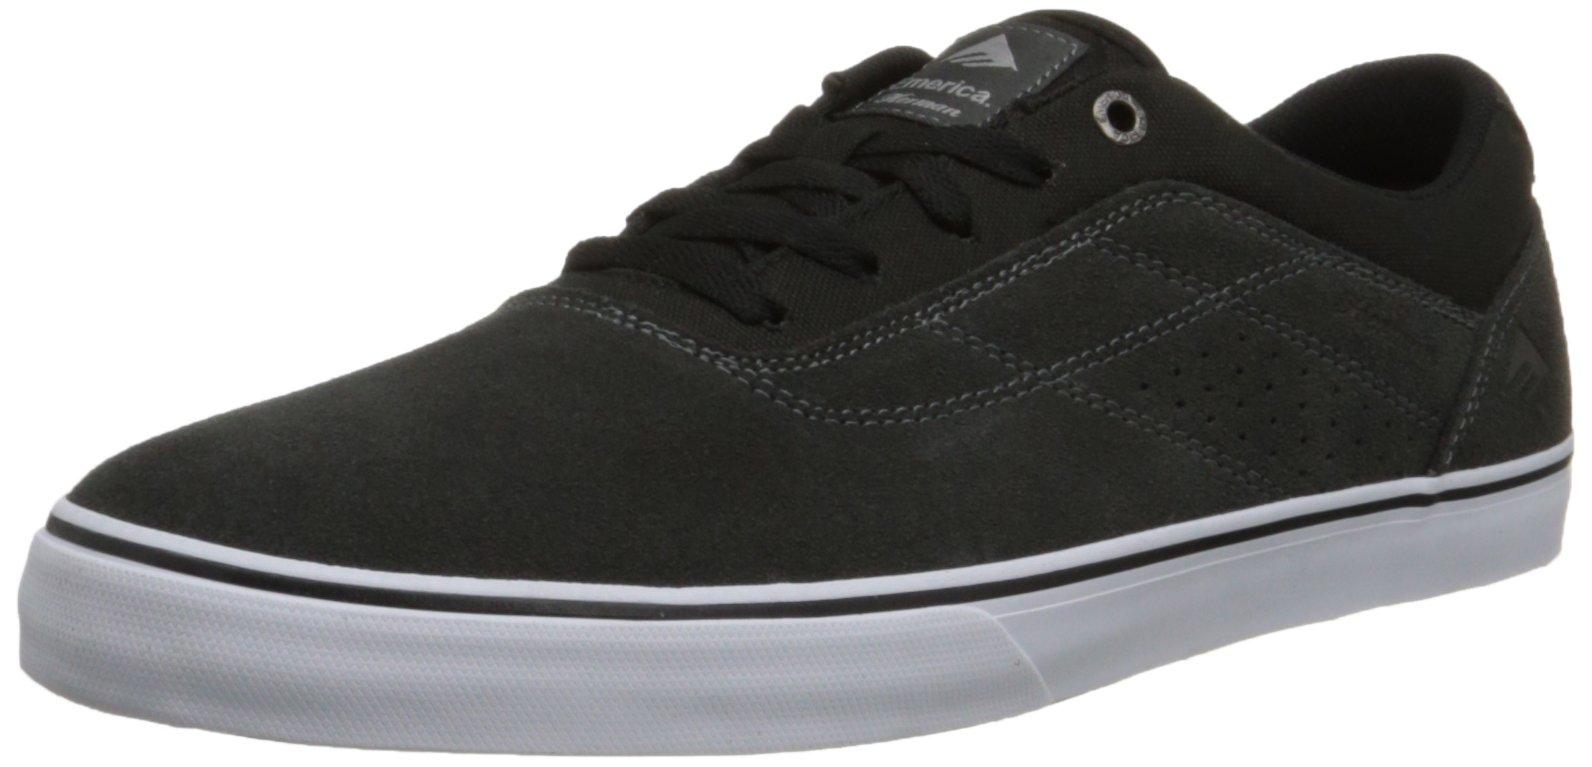 Emerica Men's The Herman G6 Vulc Skate Shoe